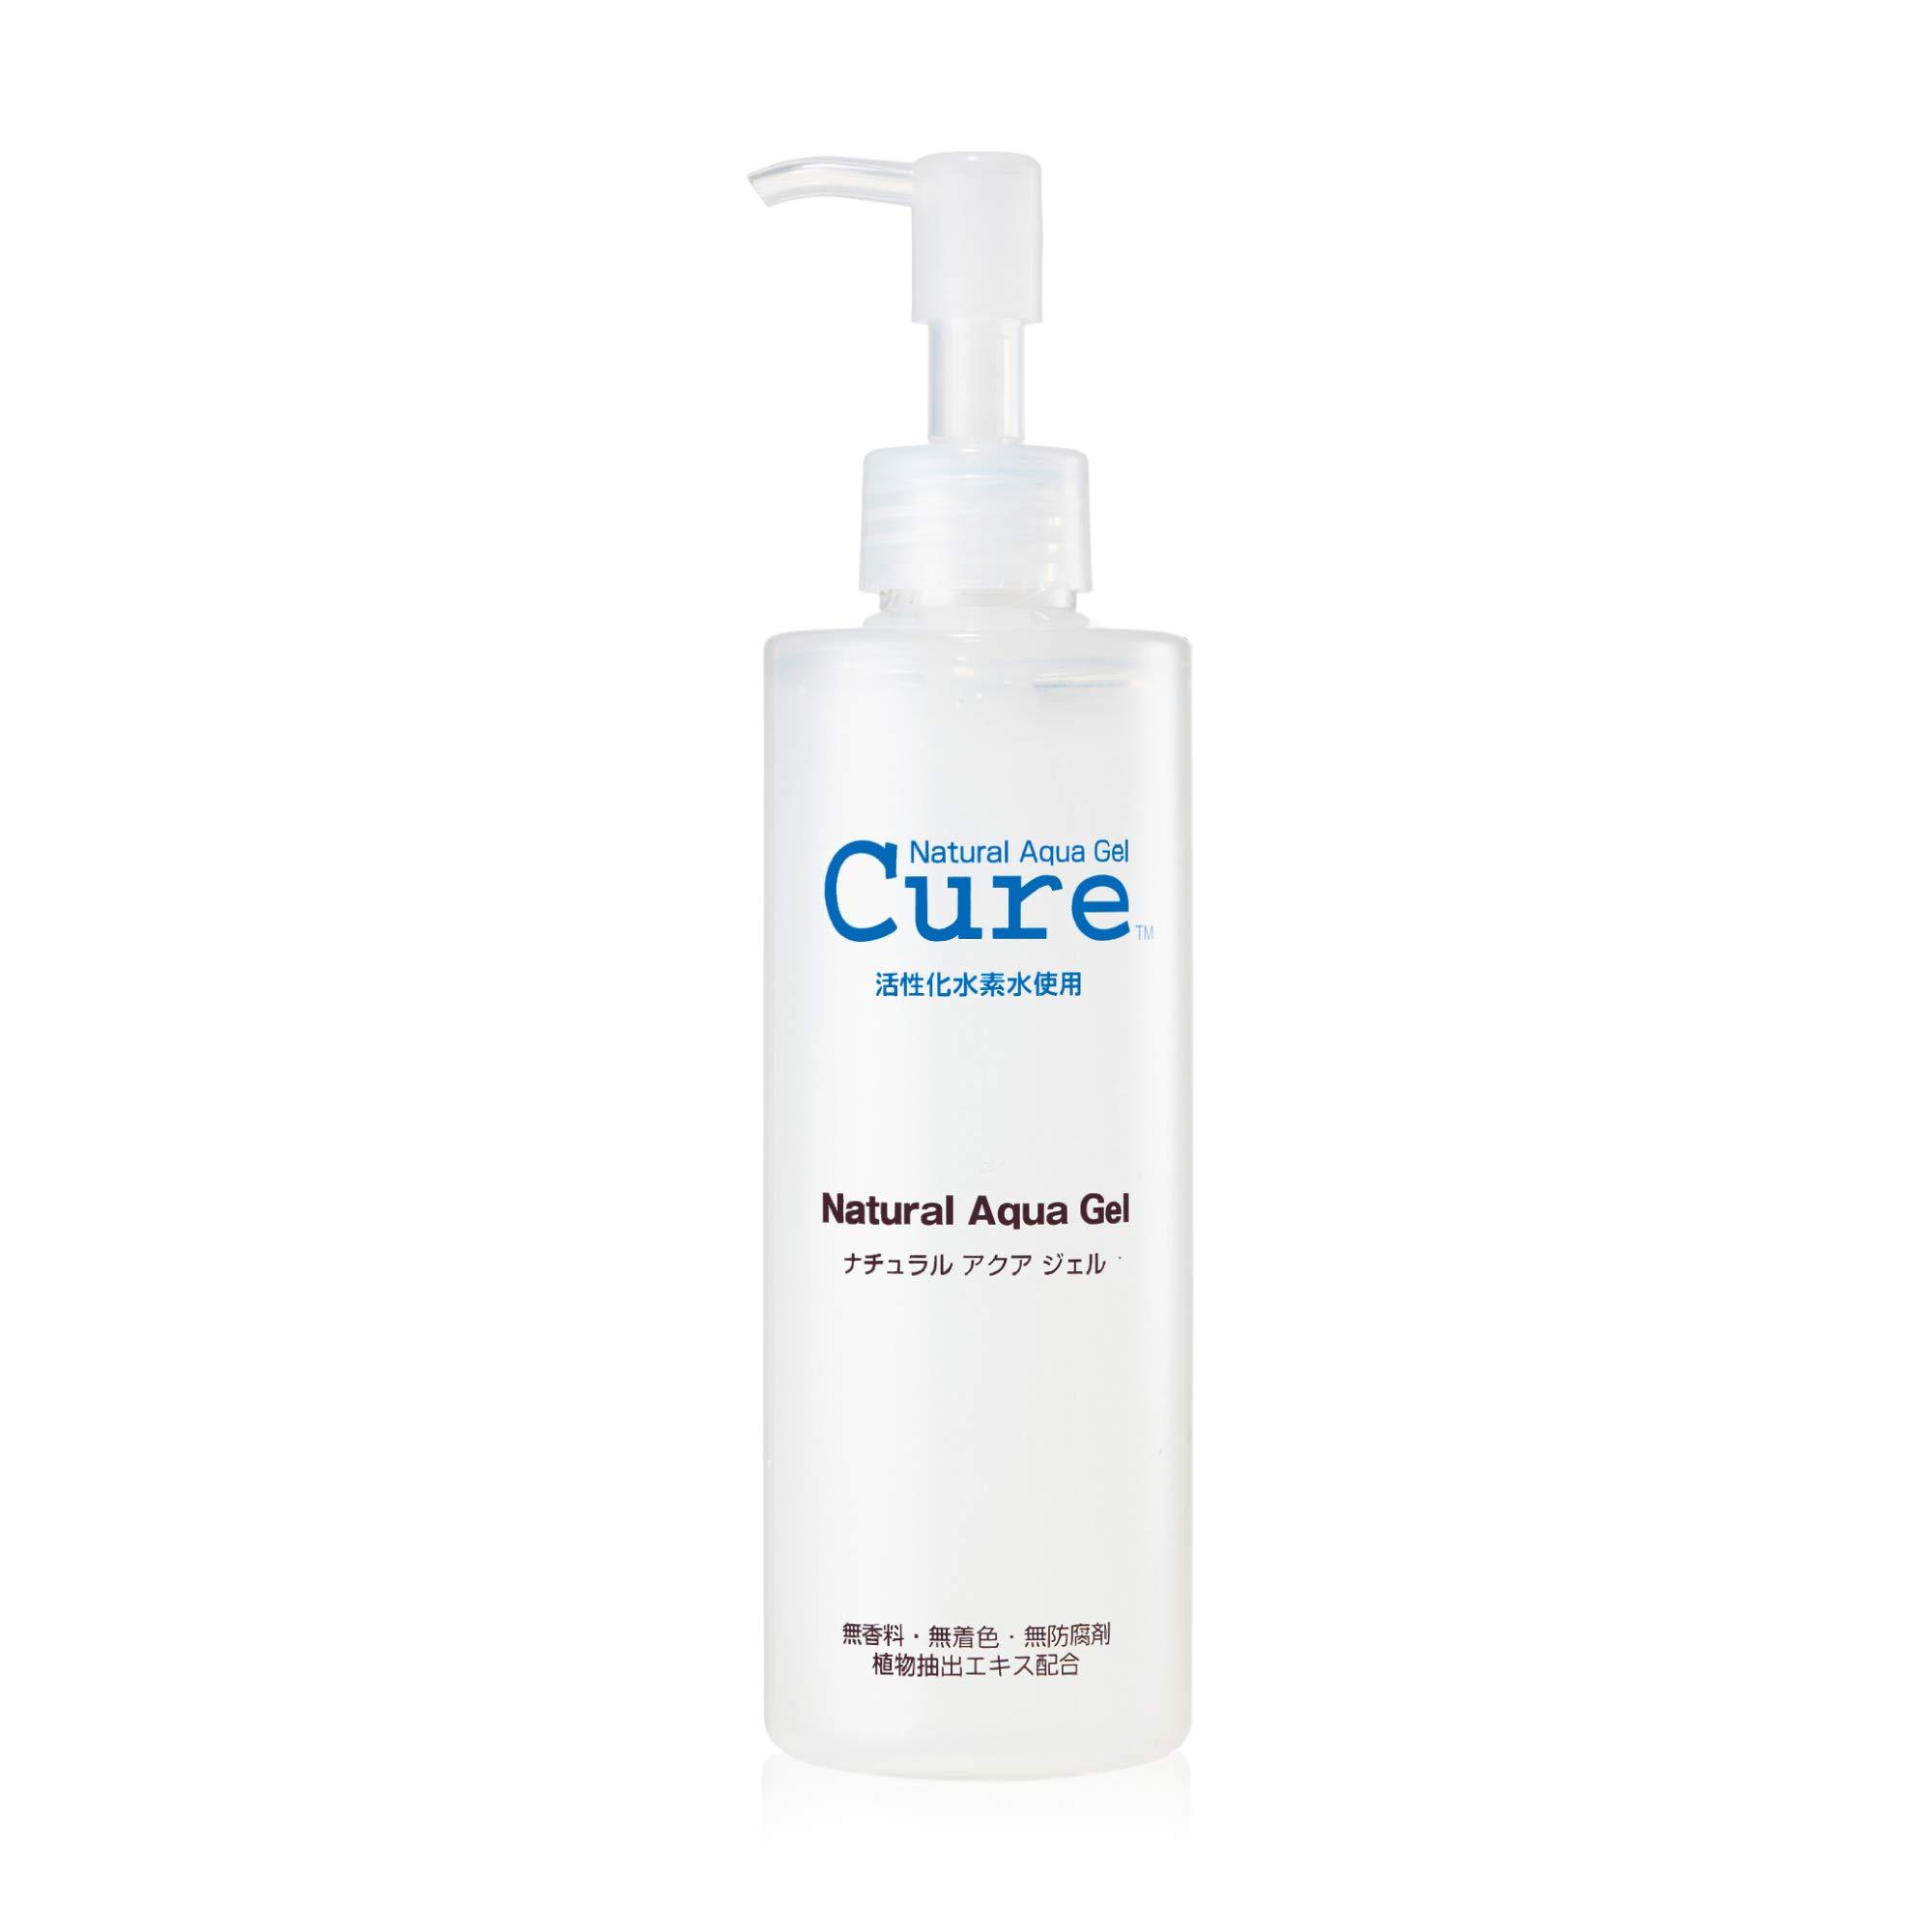 TOYO - CURE: Natural Aqua Gel, Water Skin Exfoliator for All Skin Types (8.5 oz - 1 Pack)